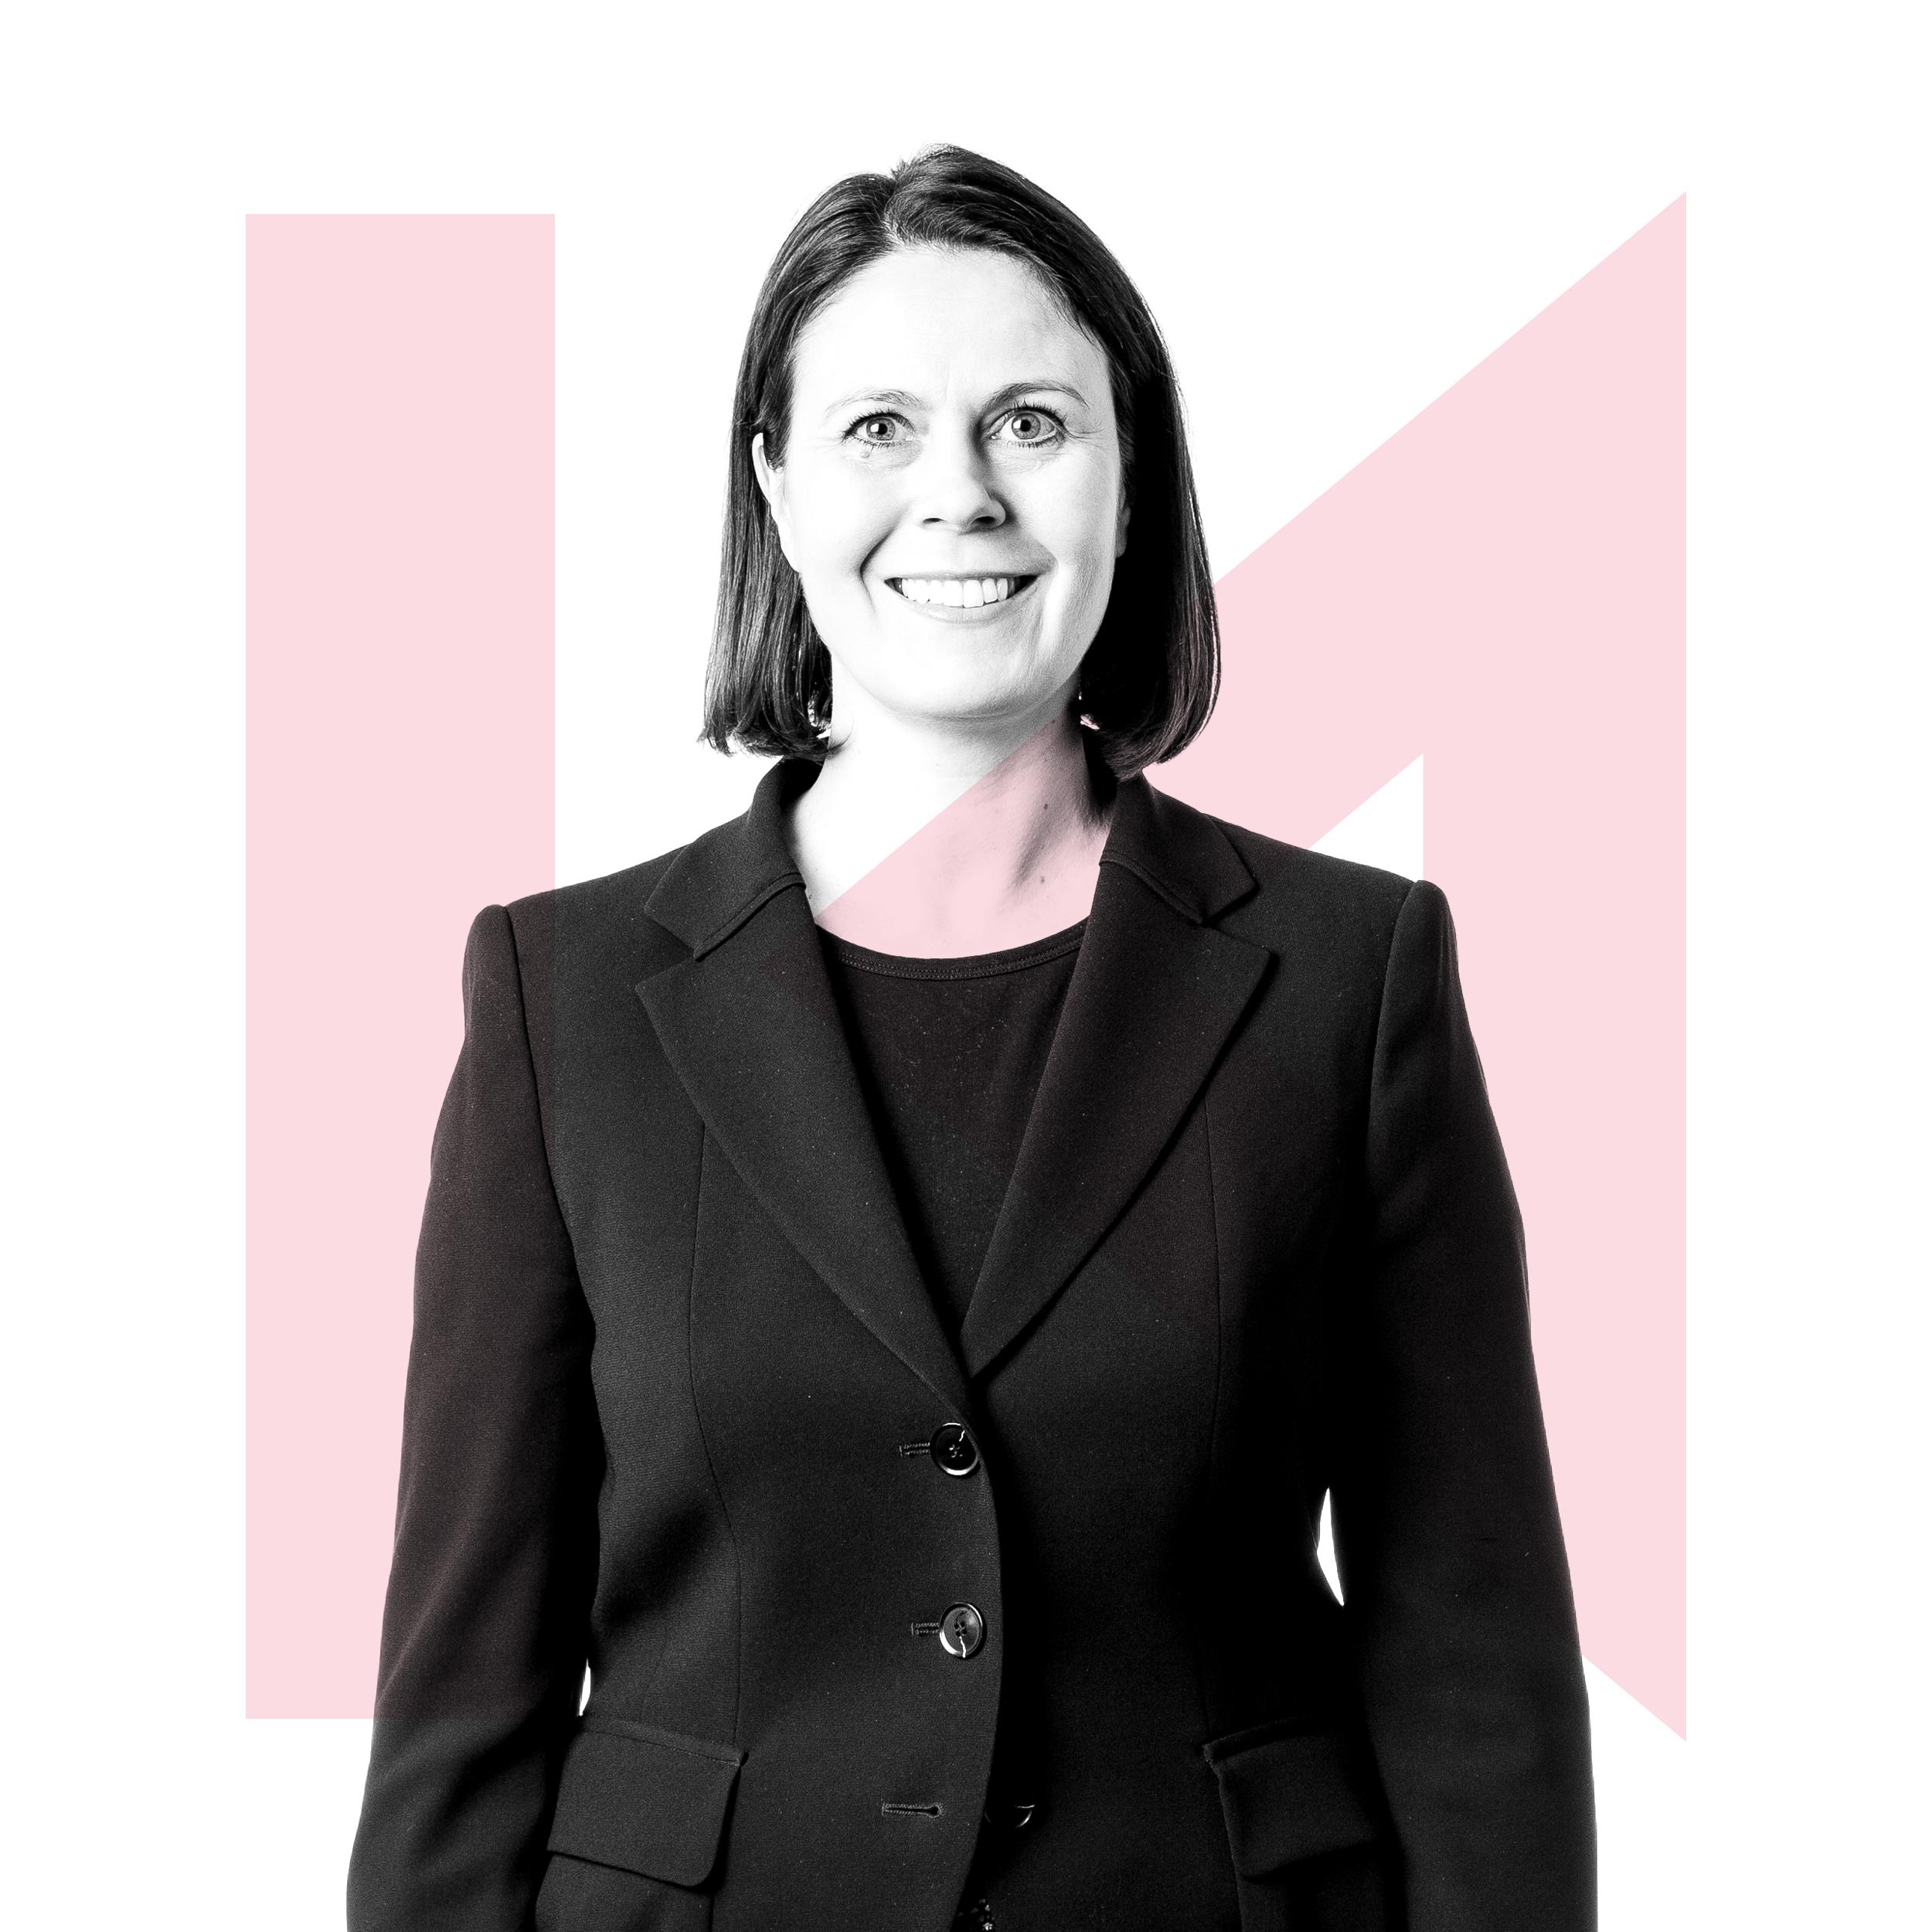 Image showing Mari Reponen